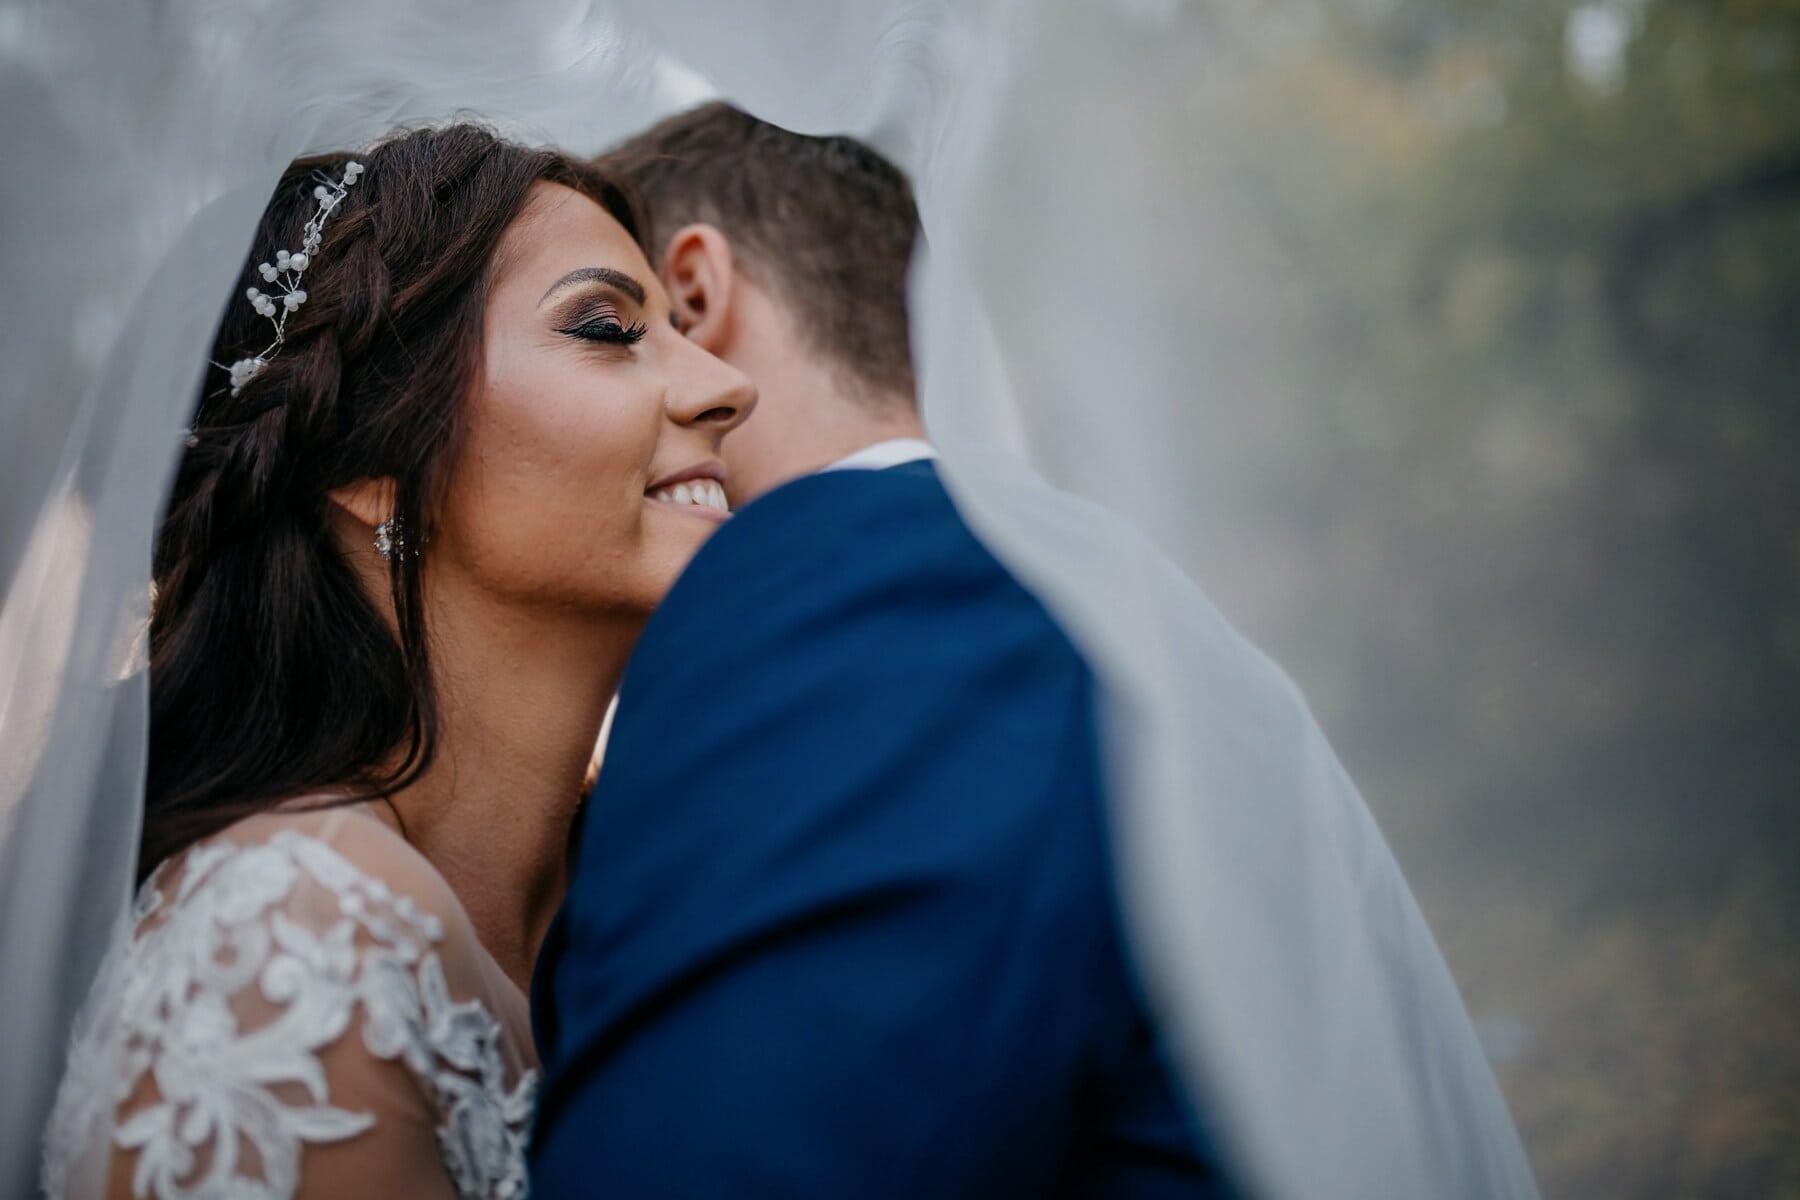 geluk, bruid, vrouw, glimlach, schouder, man, bruidegom, bruiloft, liefde, vrouw